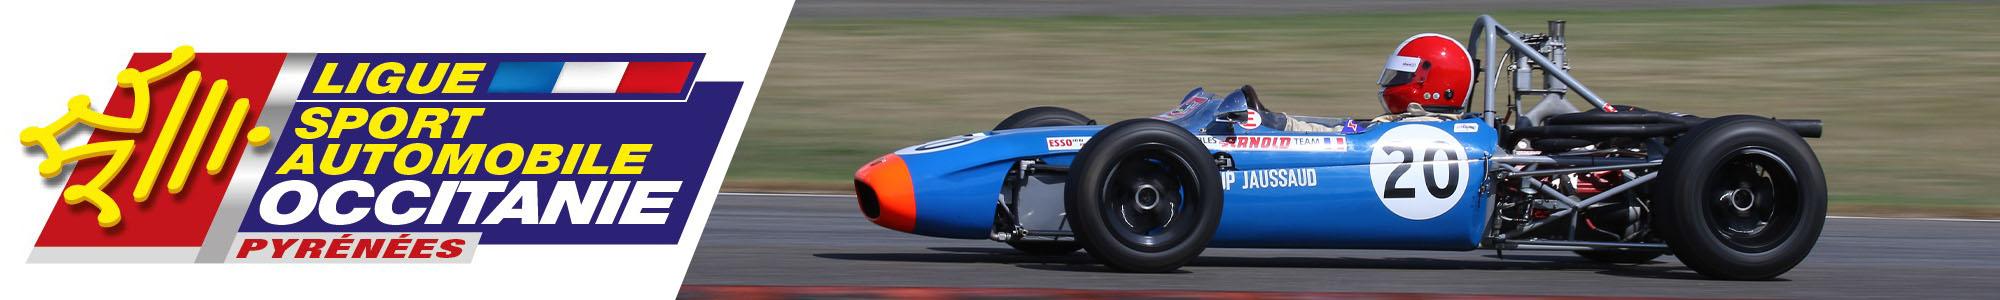 Ligue du Sport Automobile Occitanie Pyrénées